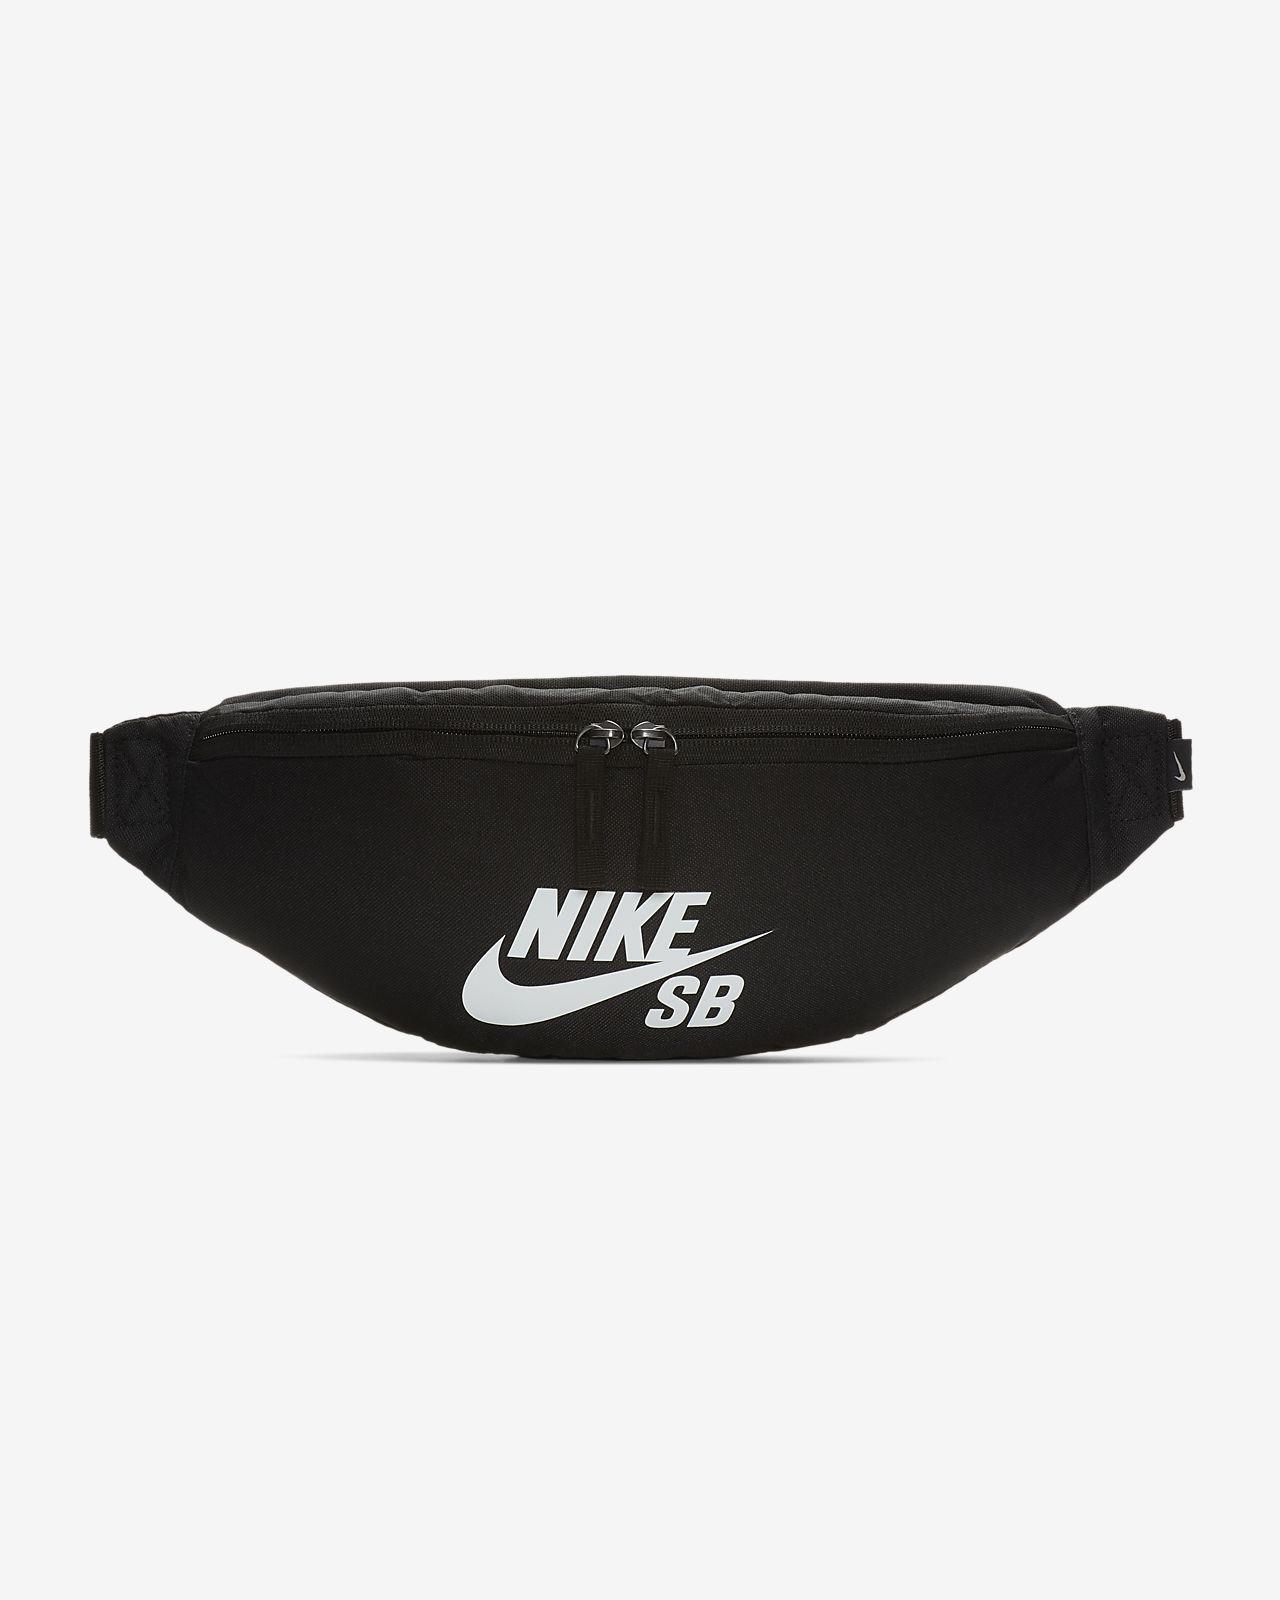 Nike SB Heritage Skate Waistpack (Small Items)